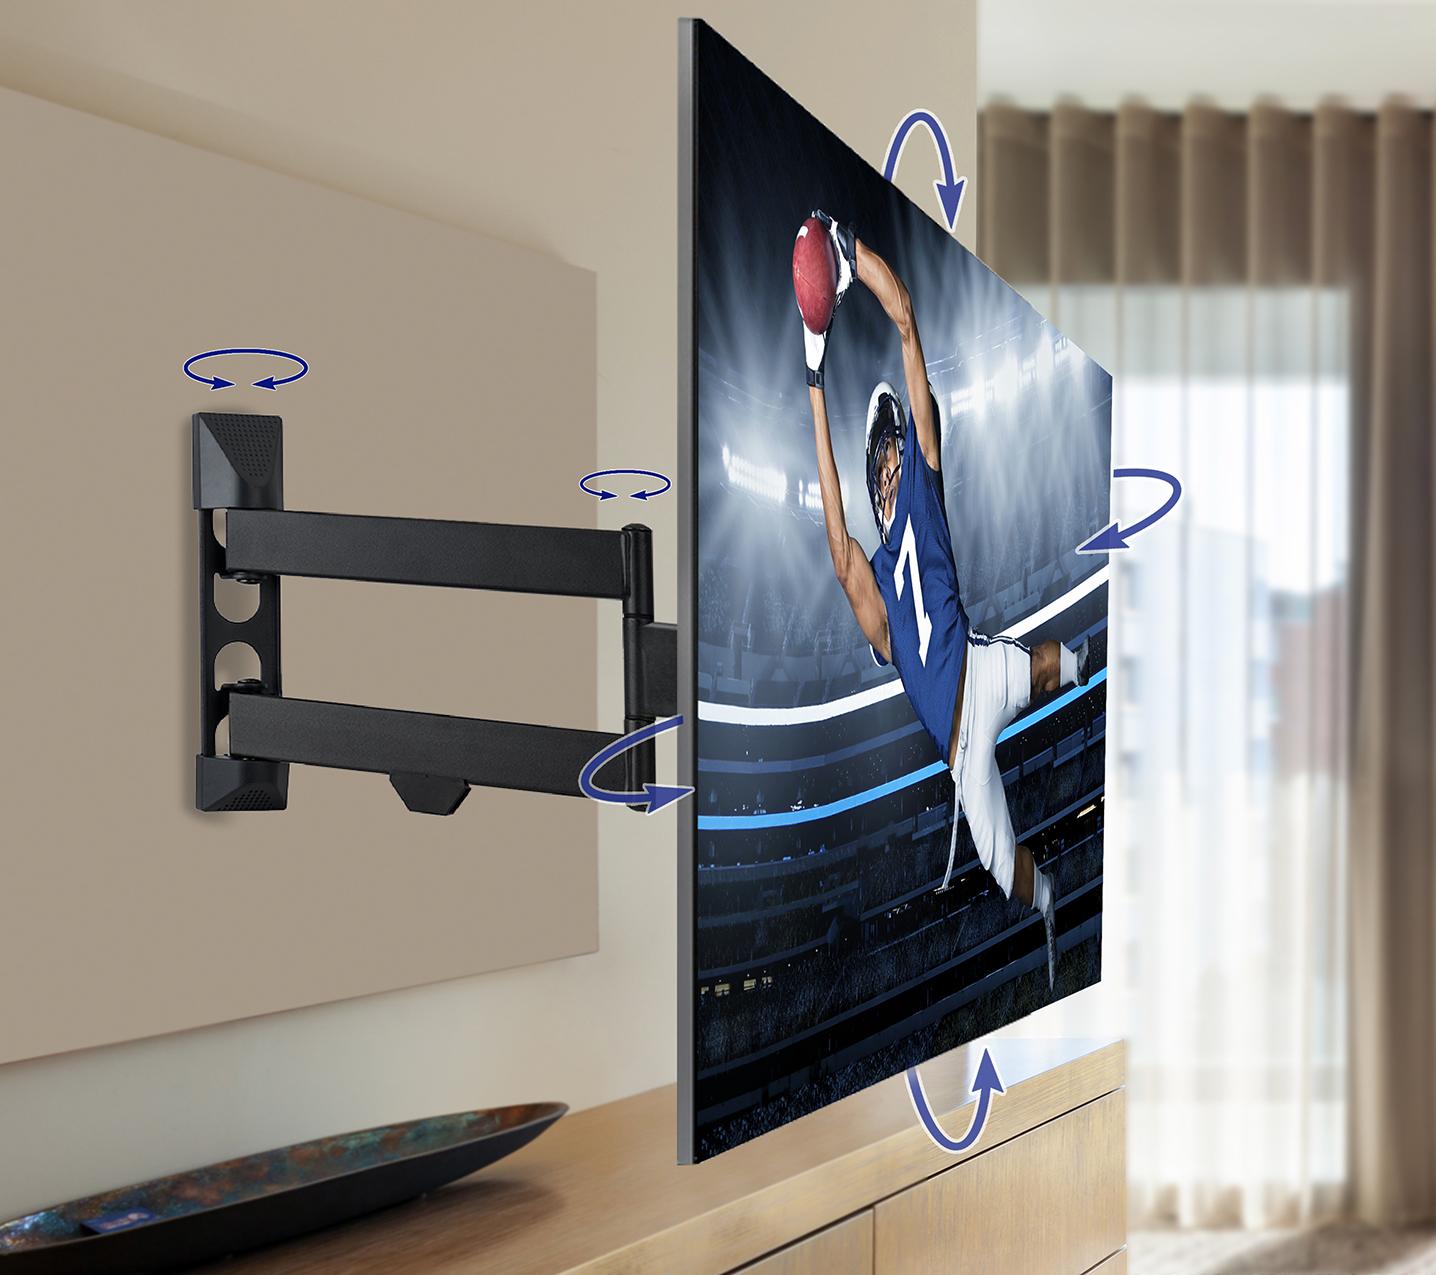 QualGear® QG-TM-020-BLK Articulating TV Mount 23-42 Inch , Black